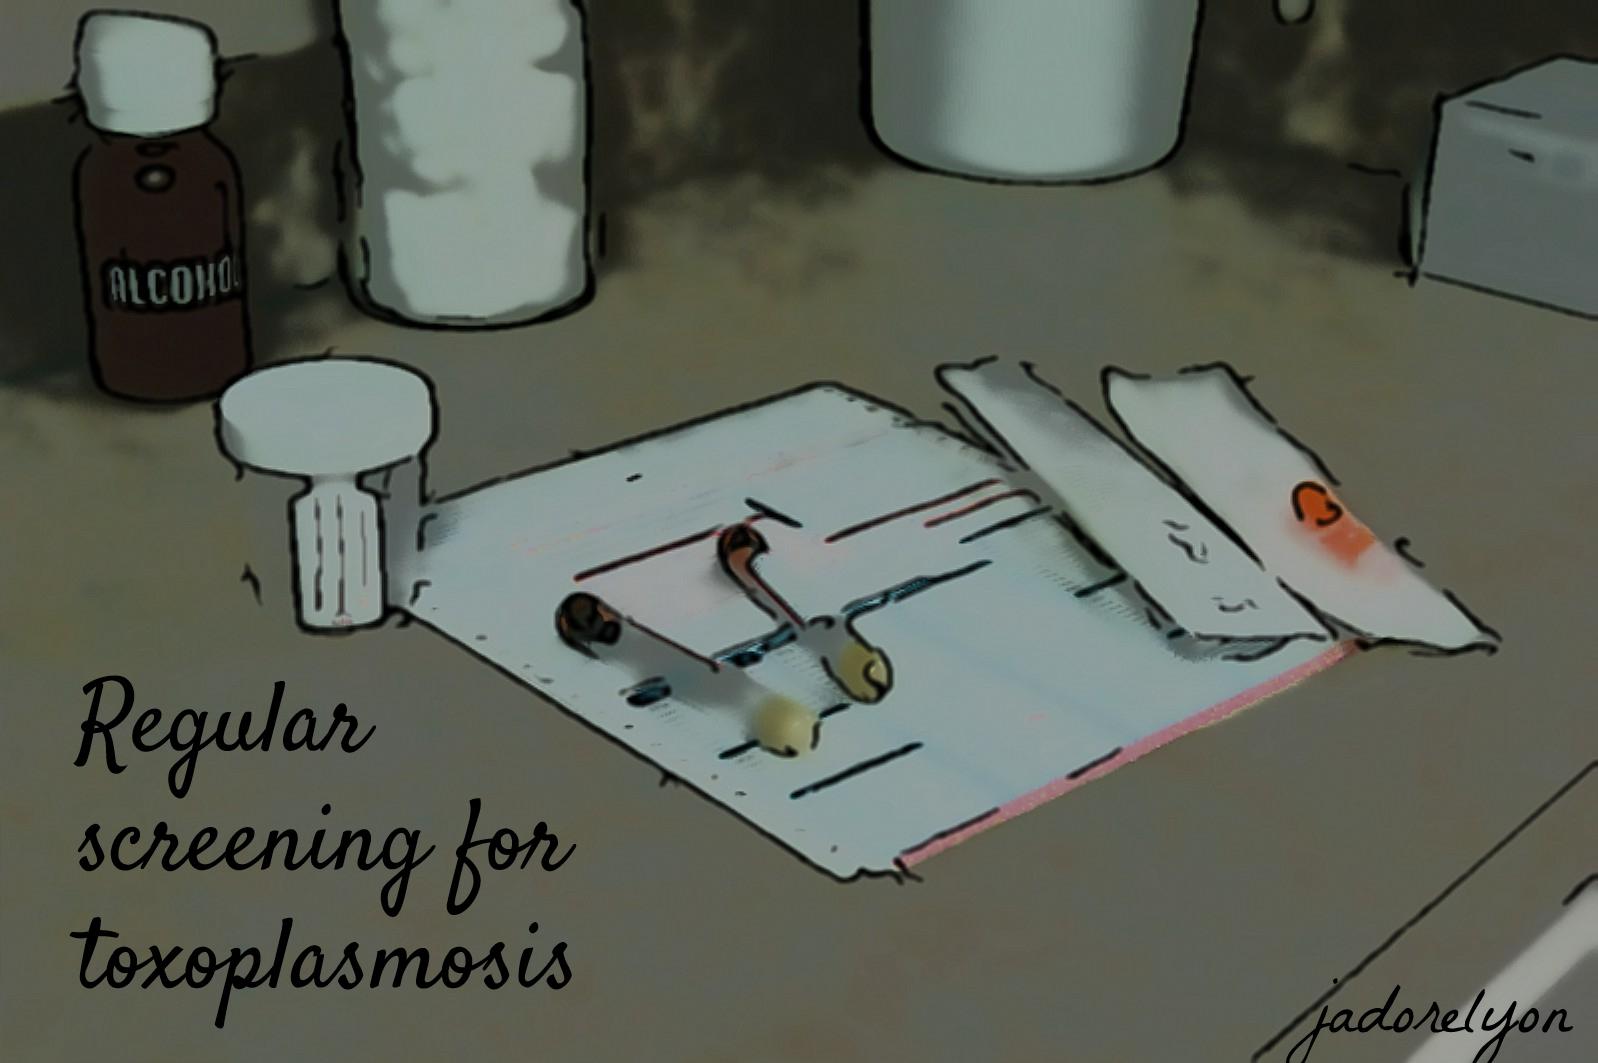 regular screening for toxoplasmosis